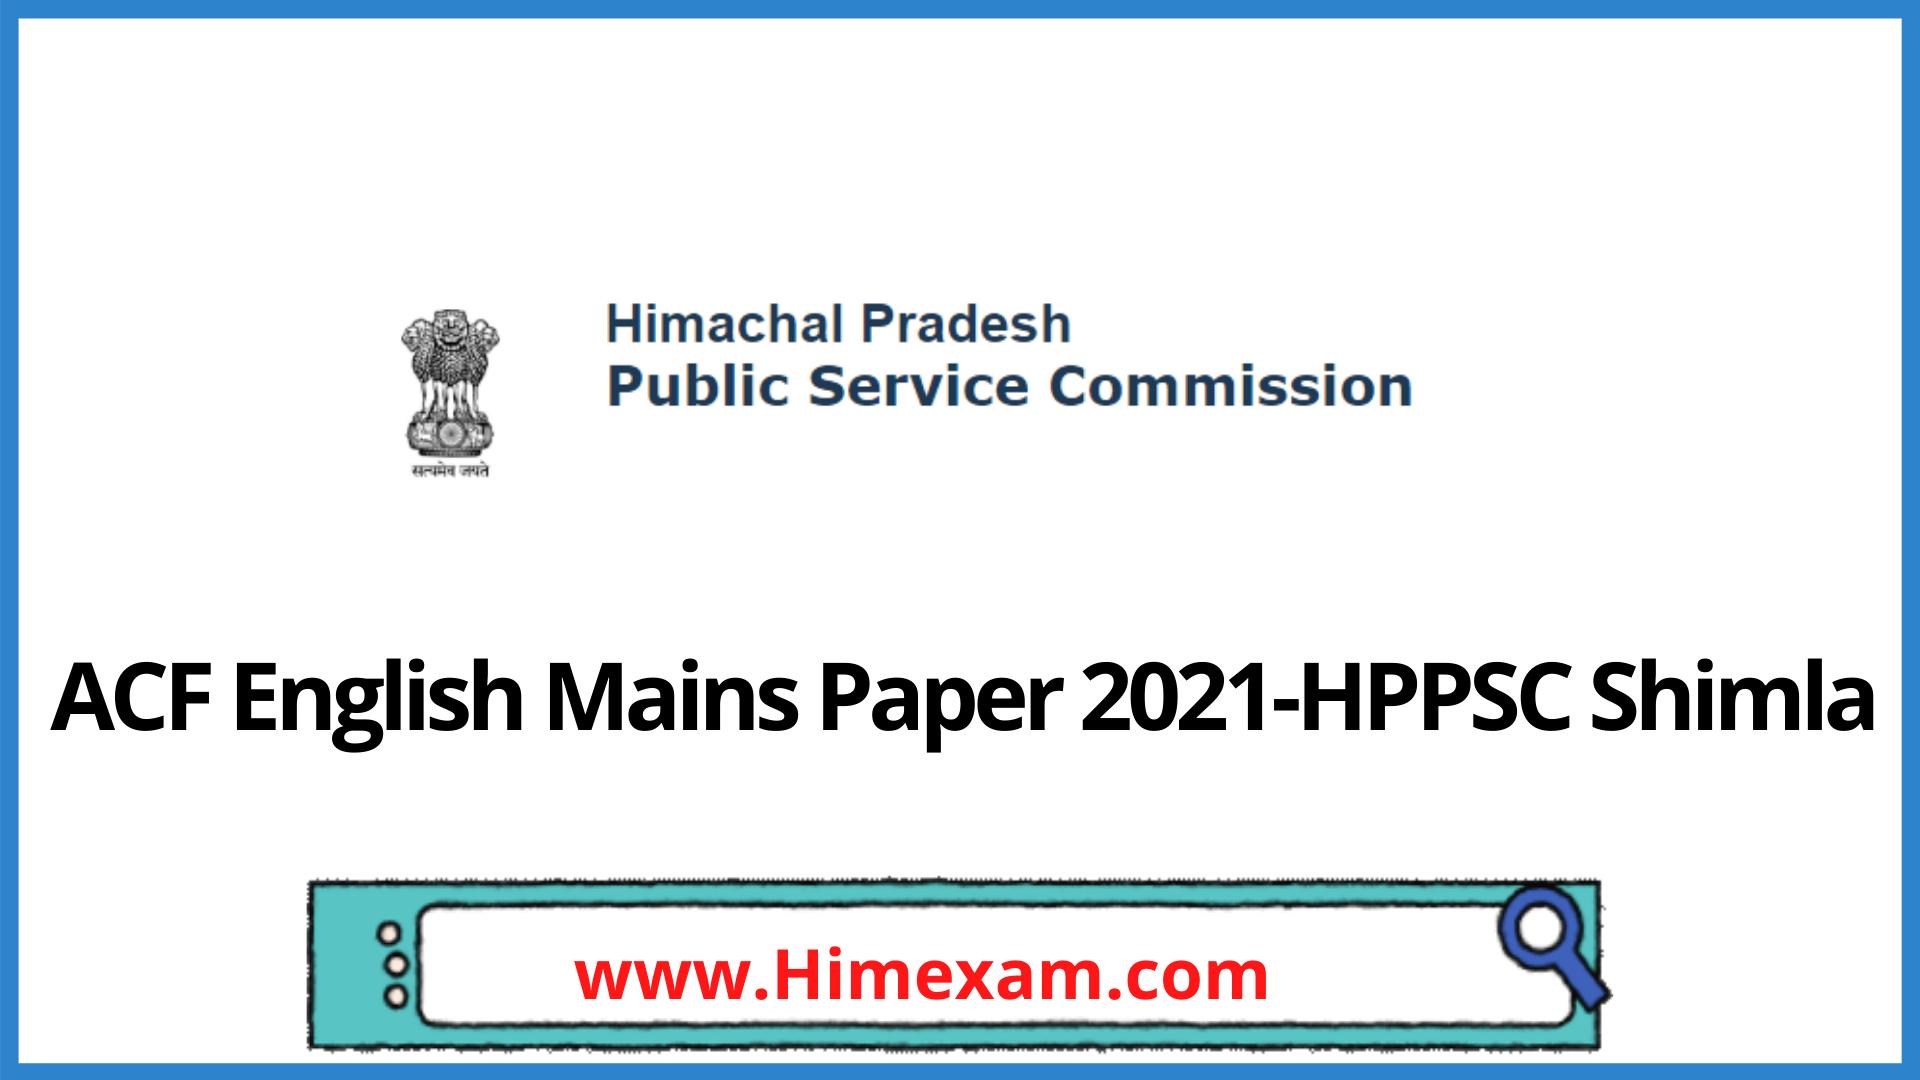 ACF English Mains Paper 2021-HPPSC Shimla